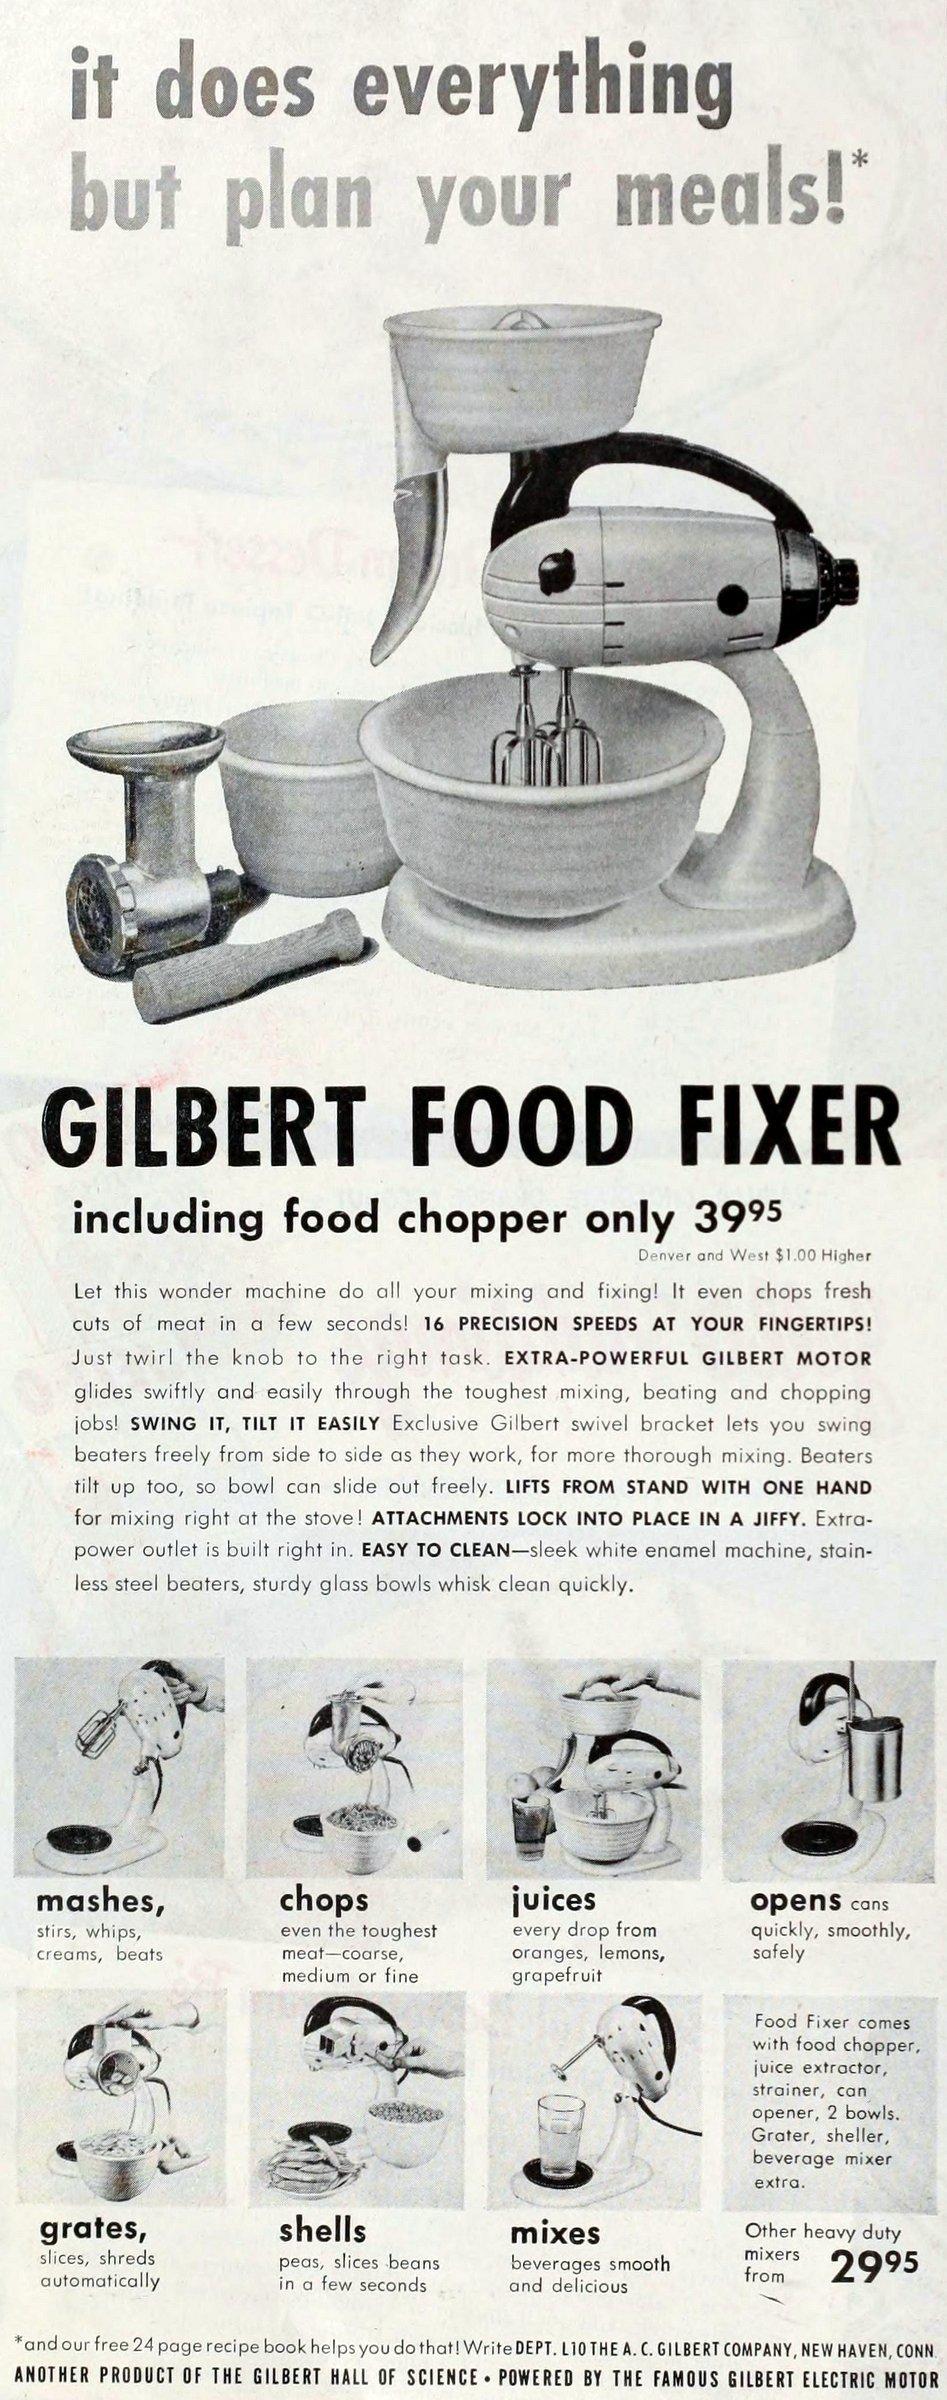 Vintage Gilbert Food Fixer machine (1949)